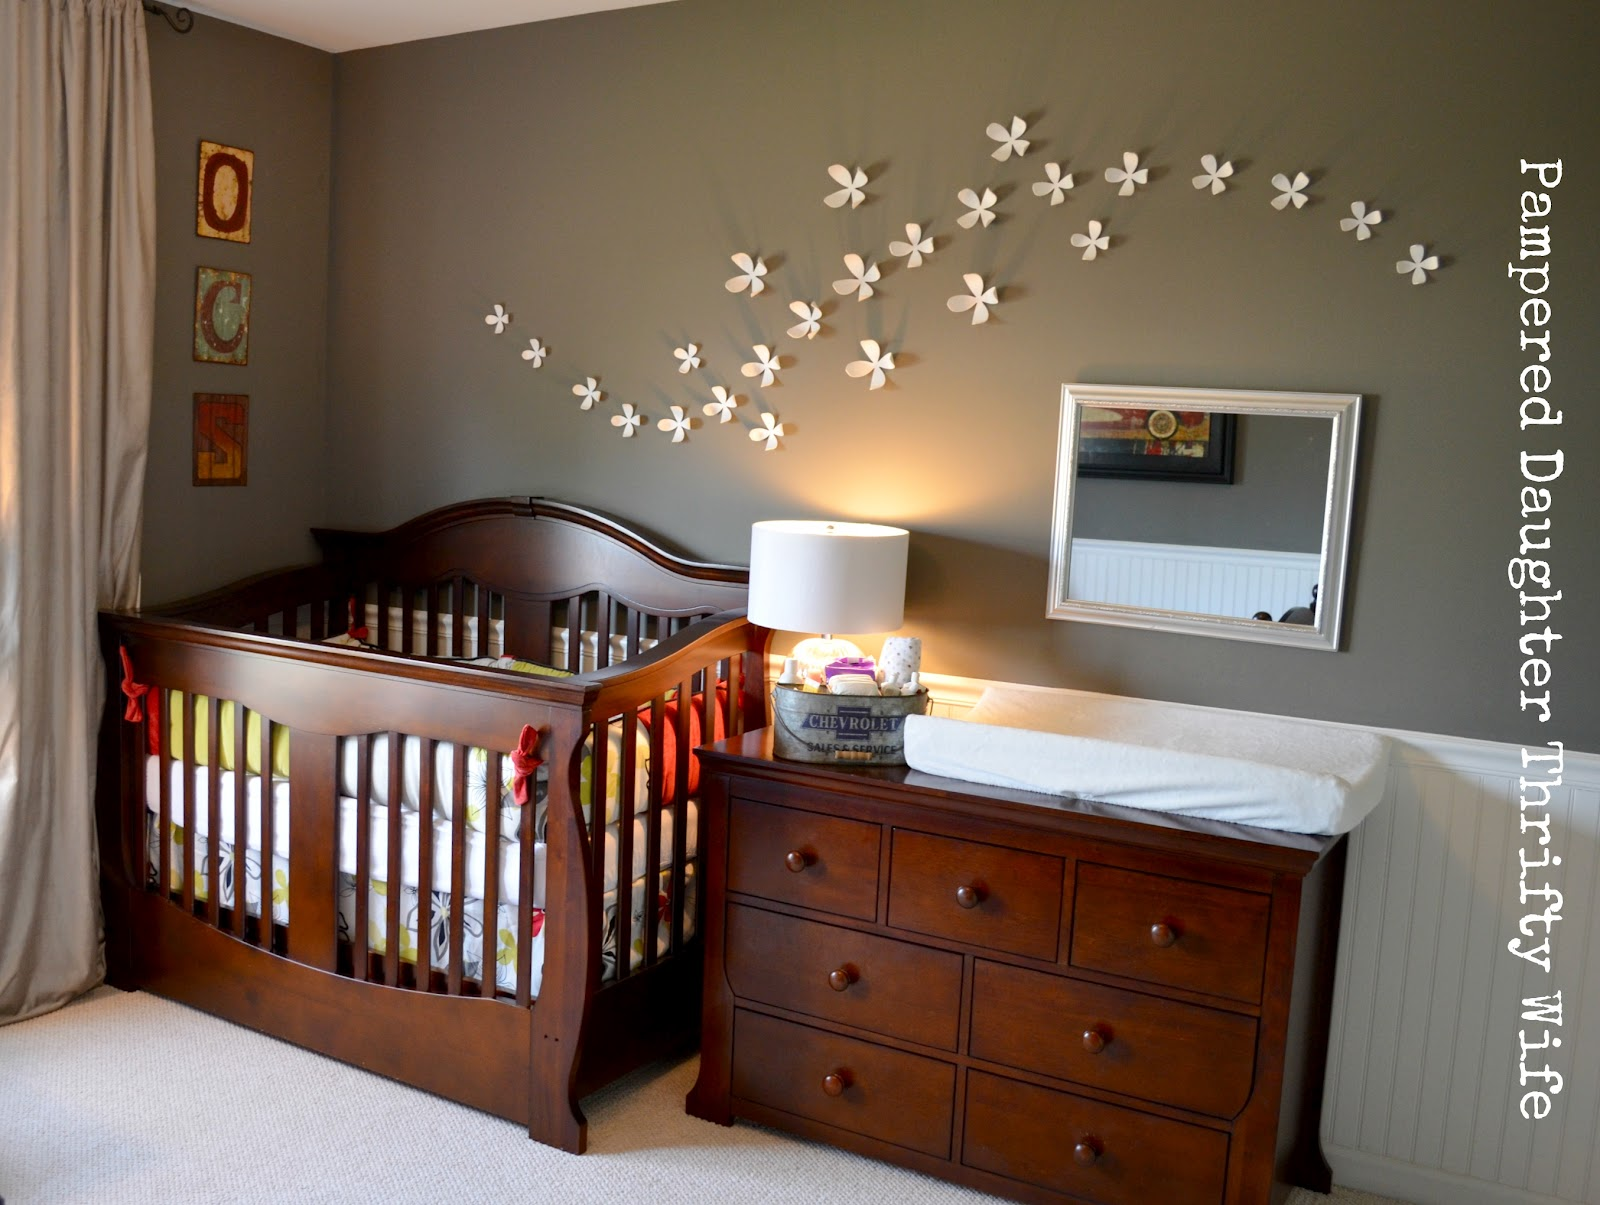 Small Nightstand For Nursery